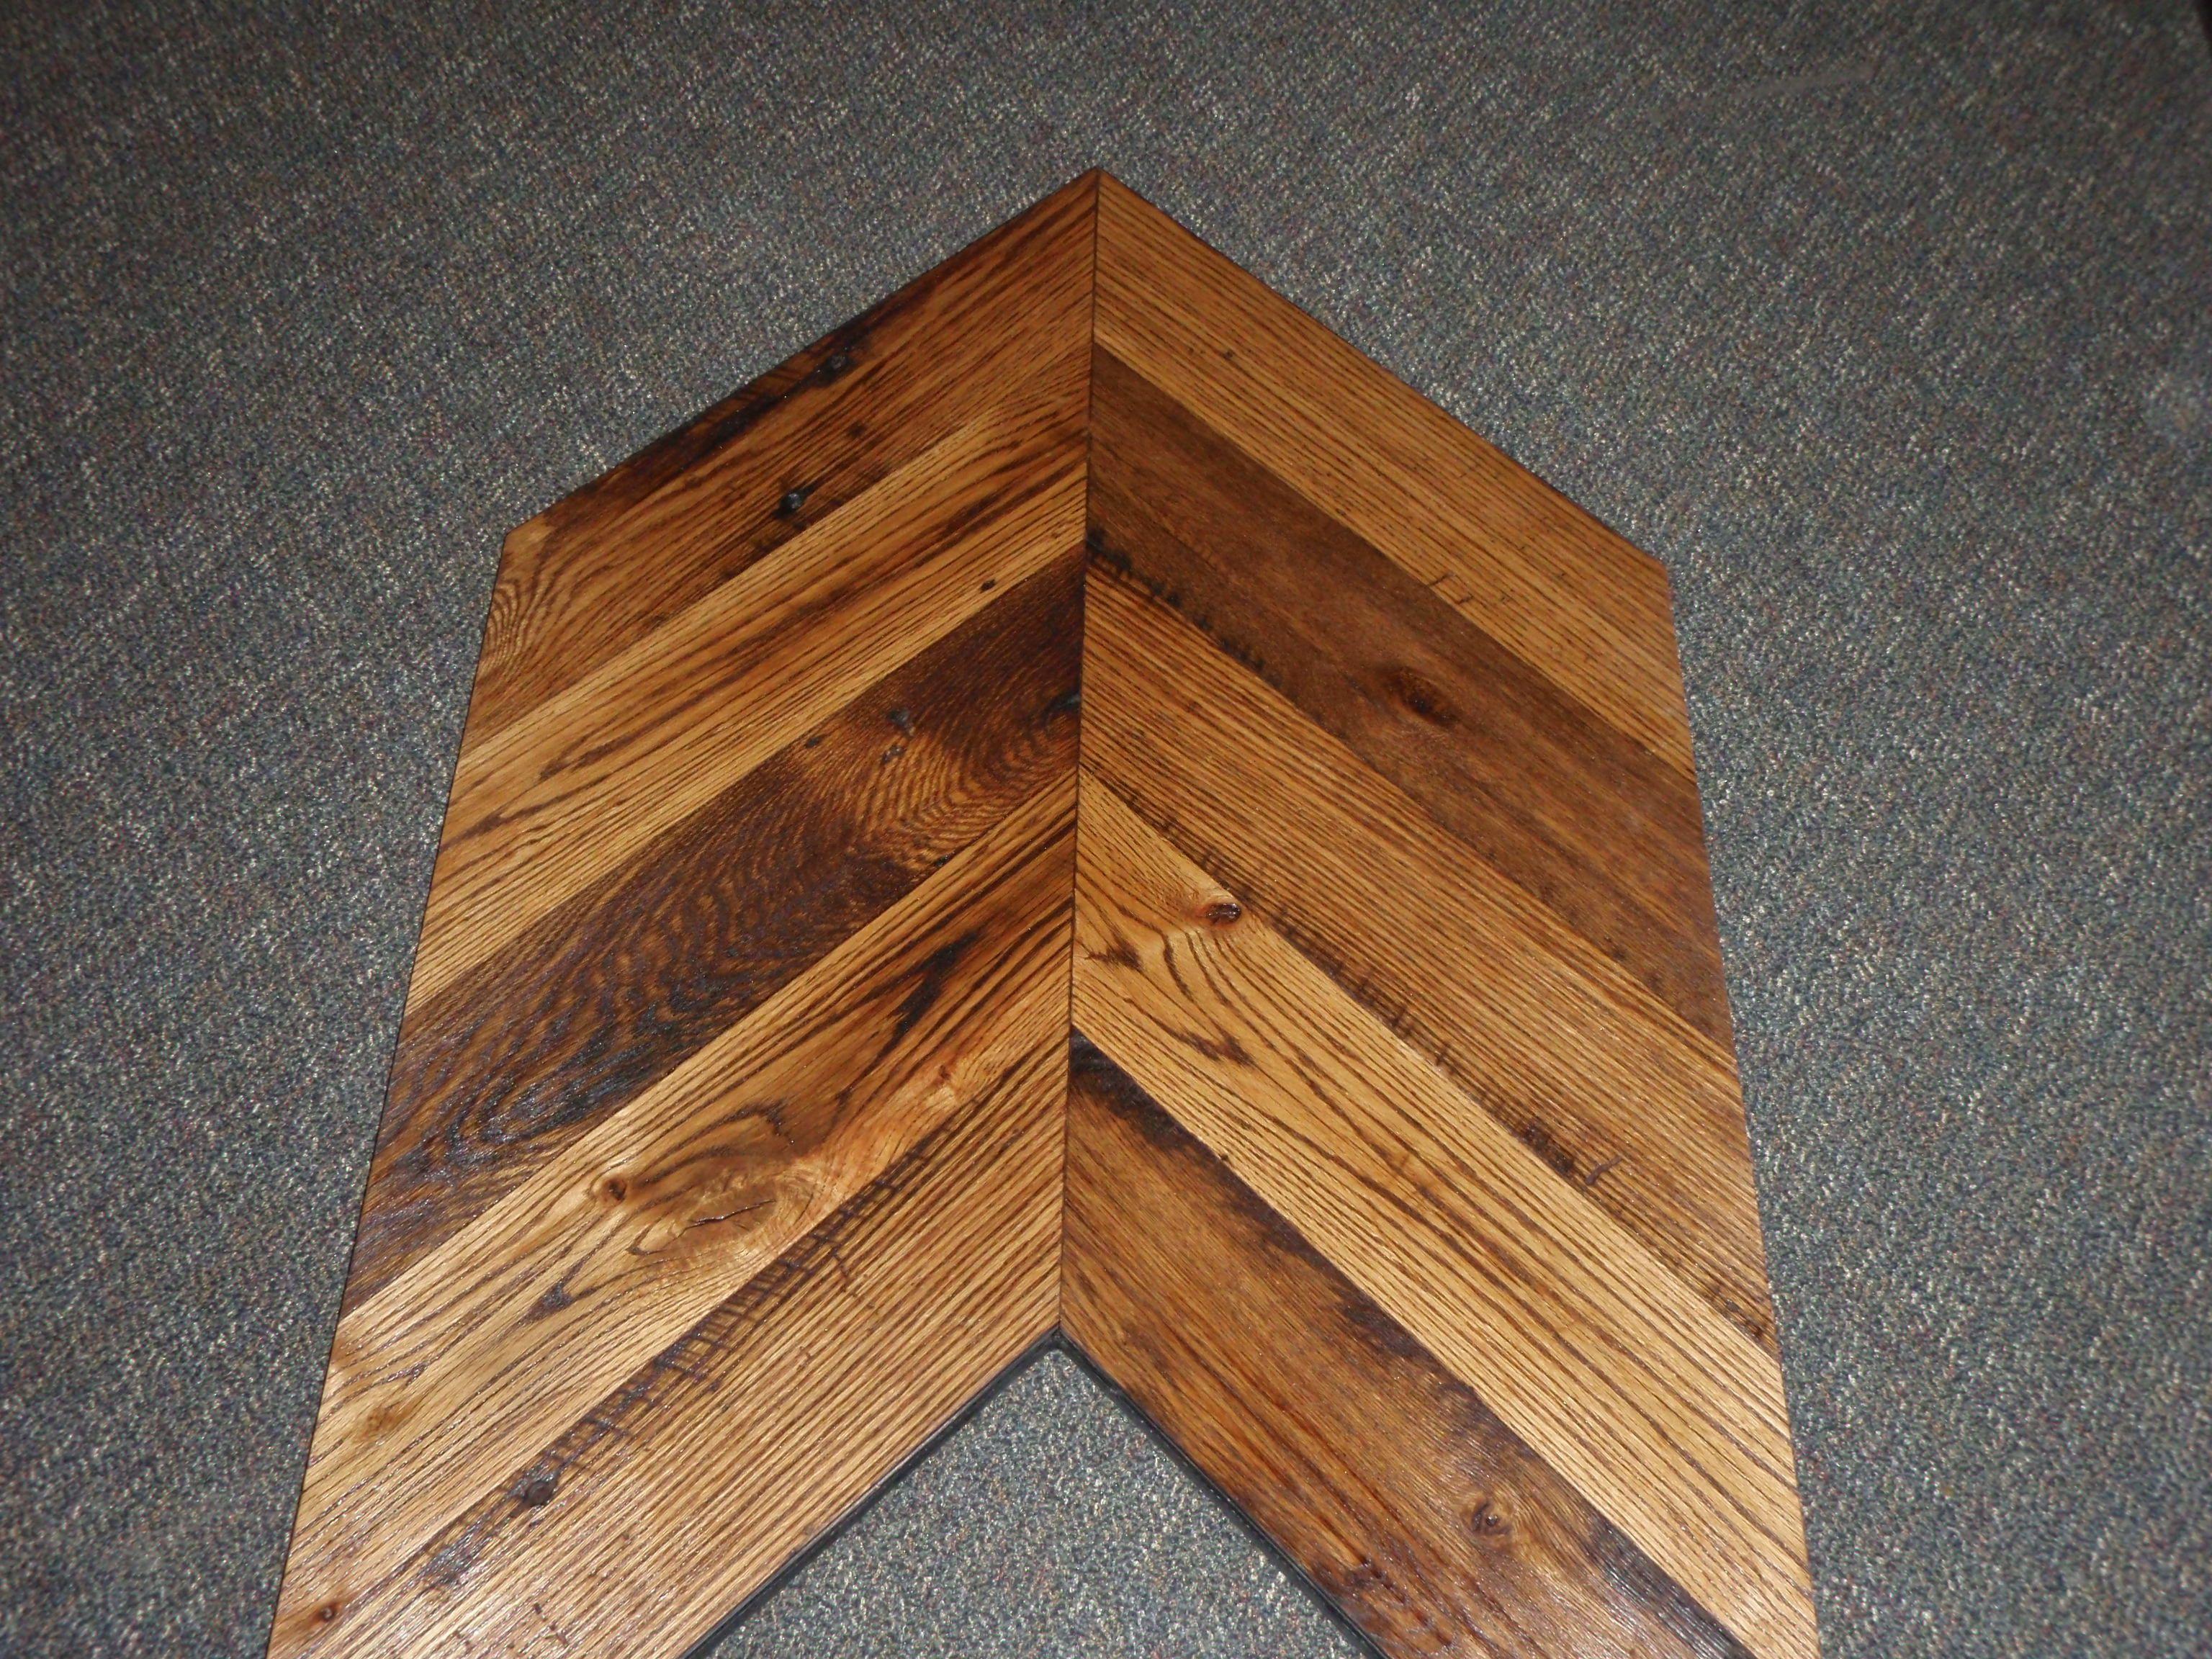 Reclaimed Mixed Oak Chevron pattern Chevron pattern